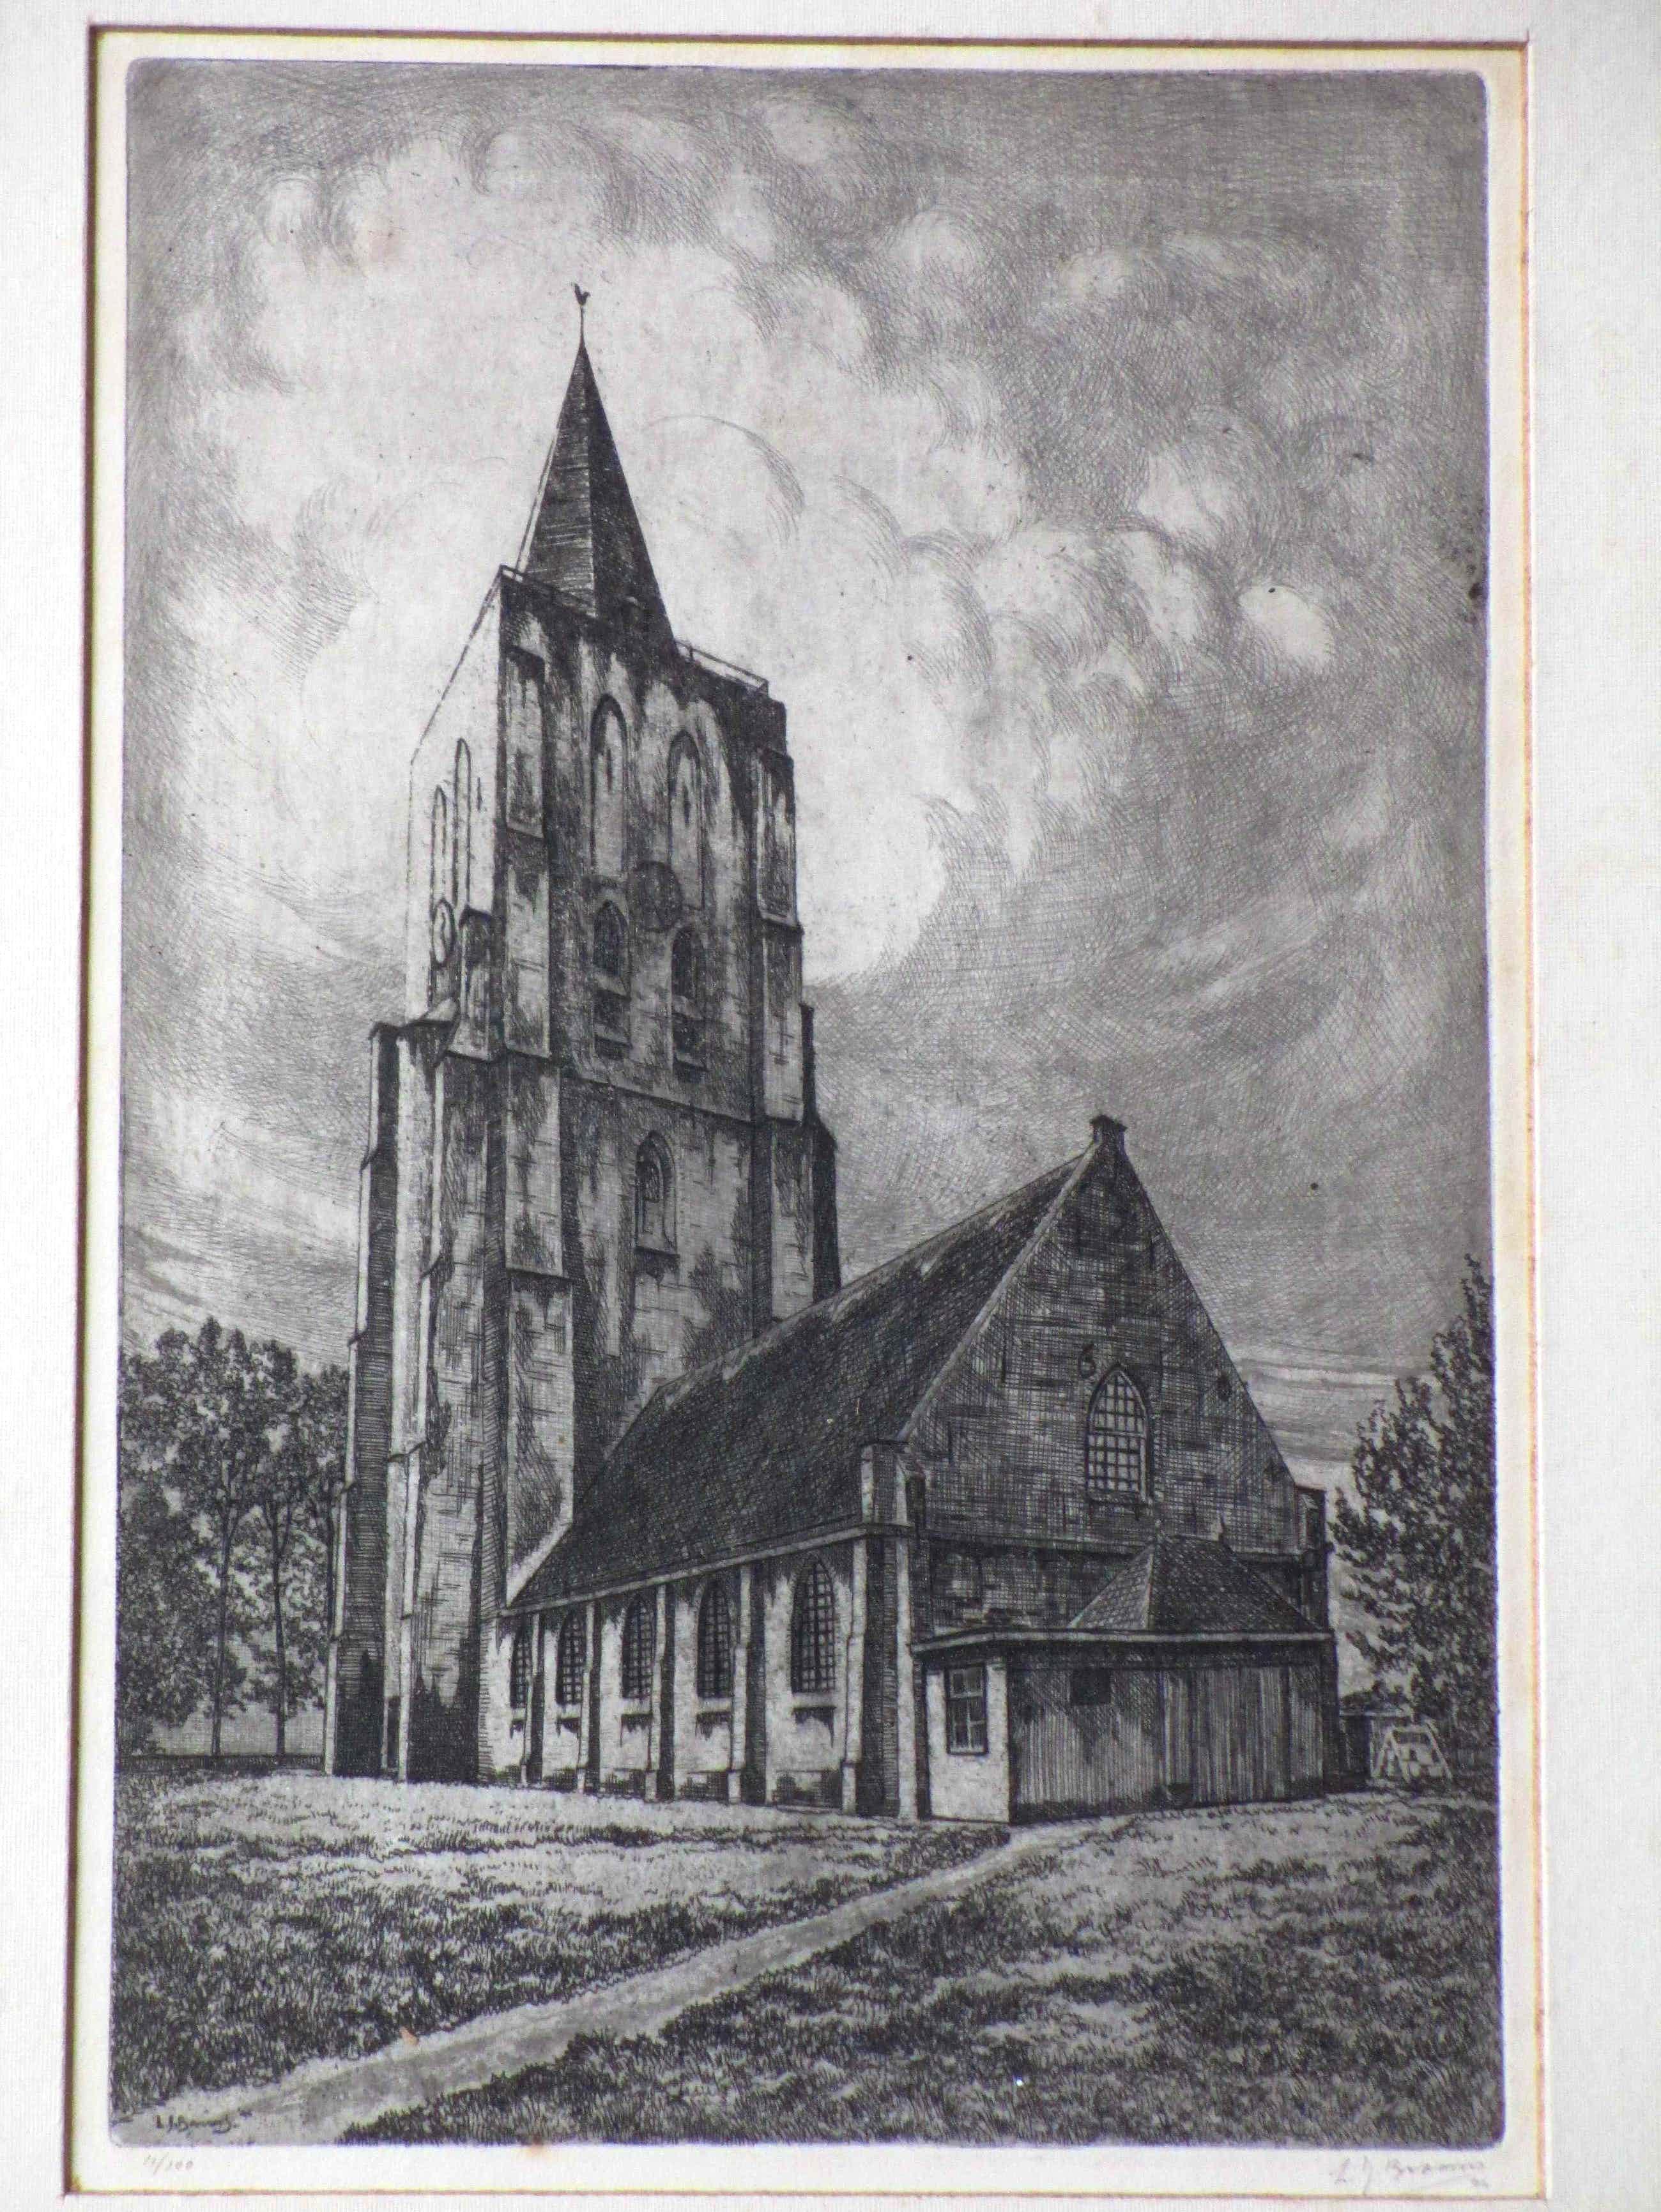 Laurens Jannis Braams - Kerktoren van Oostkapelle - Ets kopen? Bied vanaf 50!